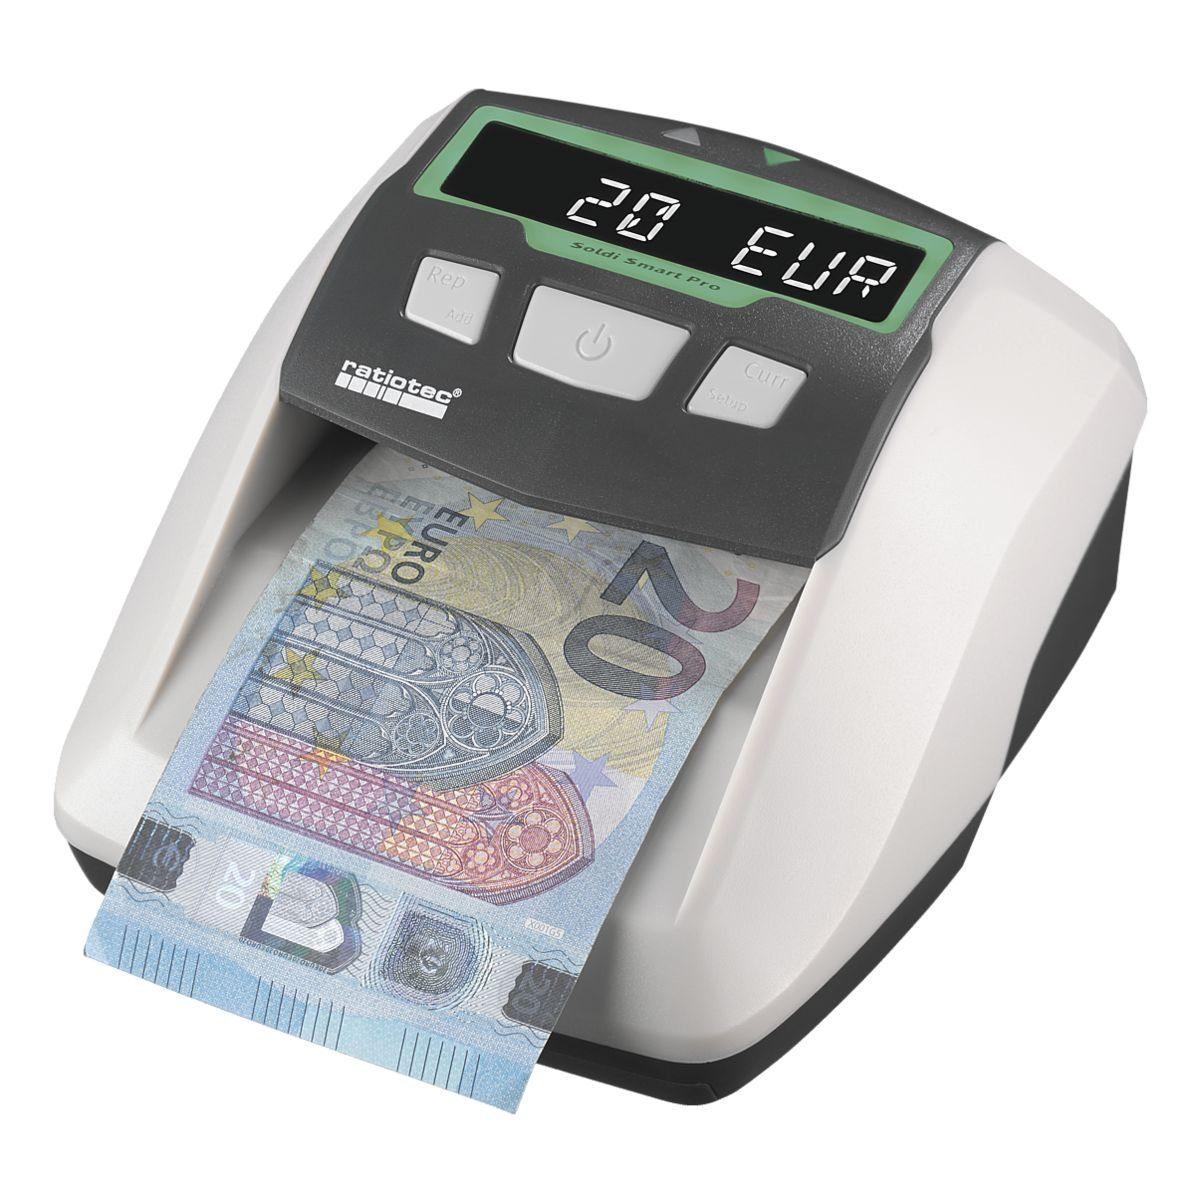 ratiotec Banknotenprüfgerät »Soldi Smart Pro« inkl...